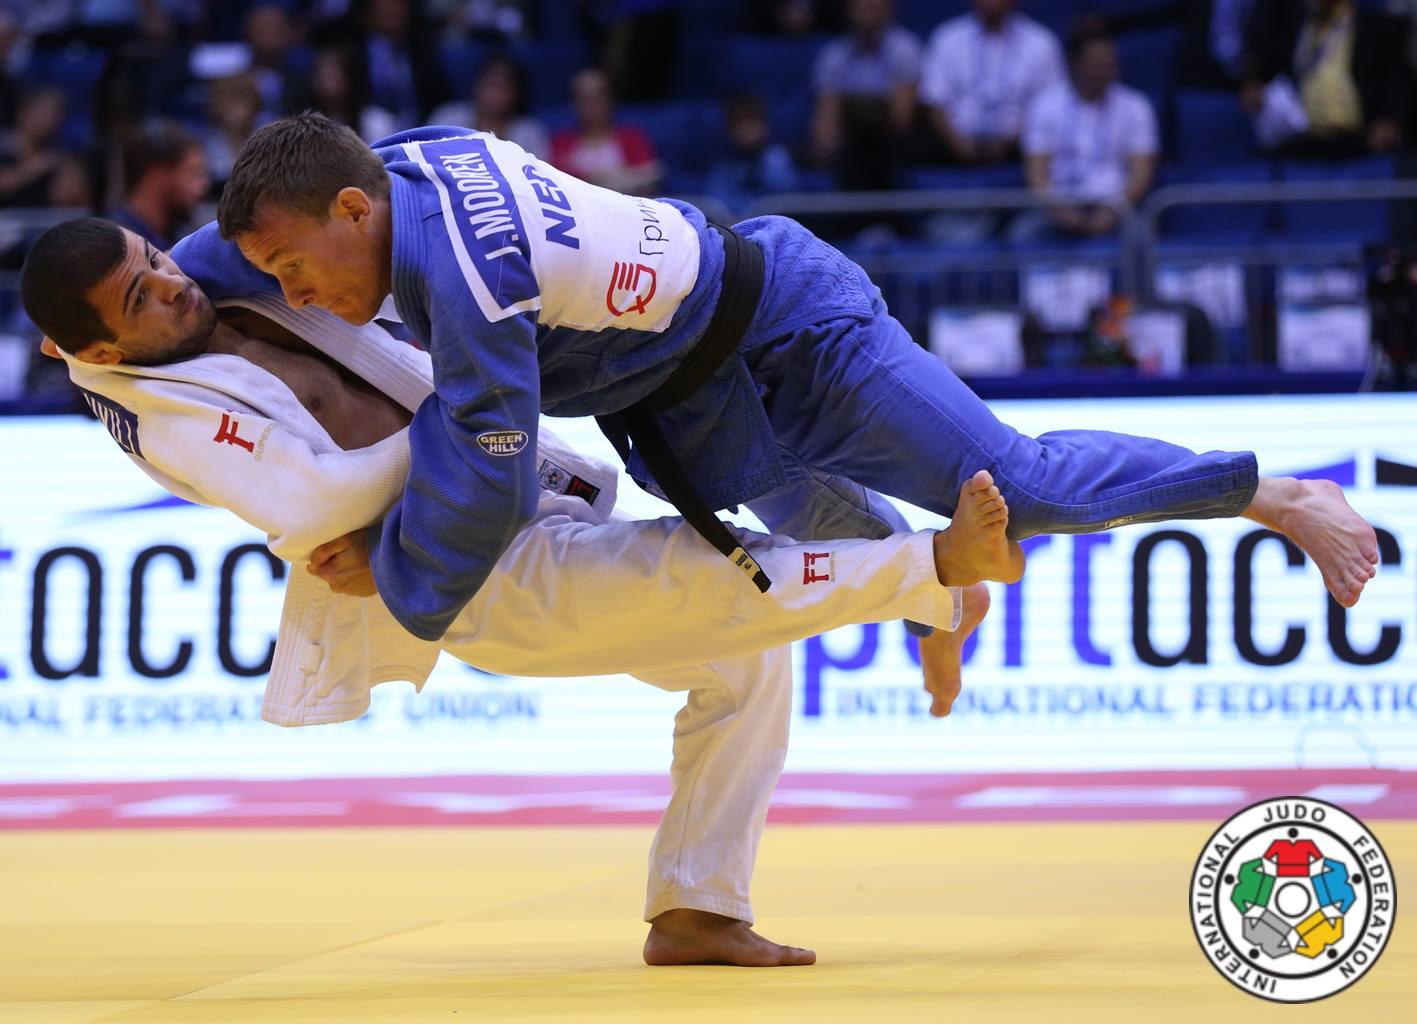 Papinashvili won bronze medal